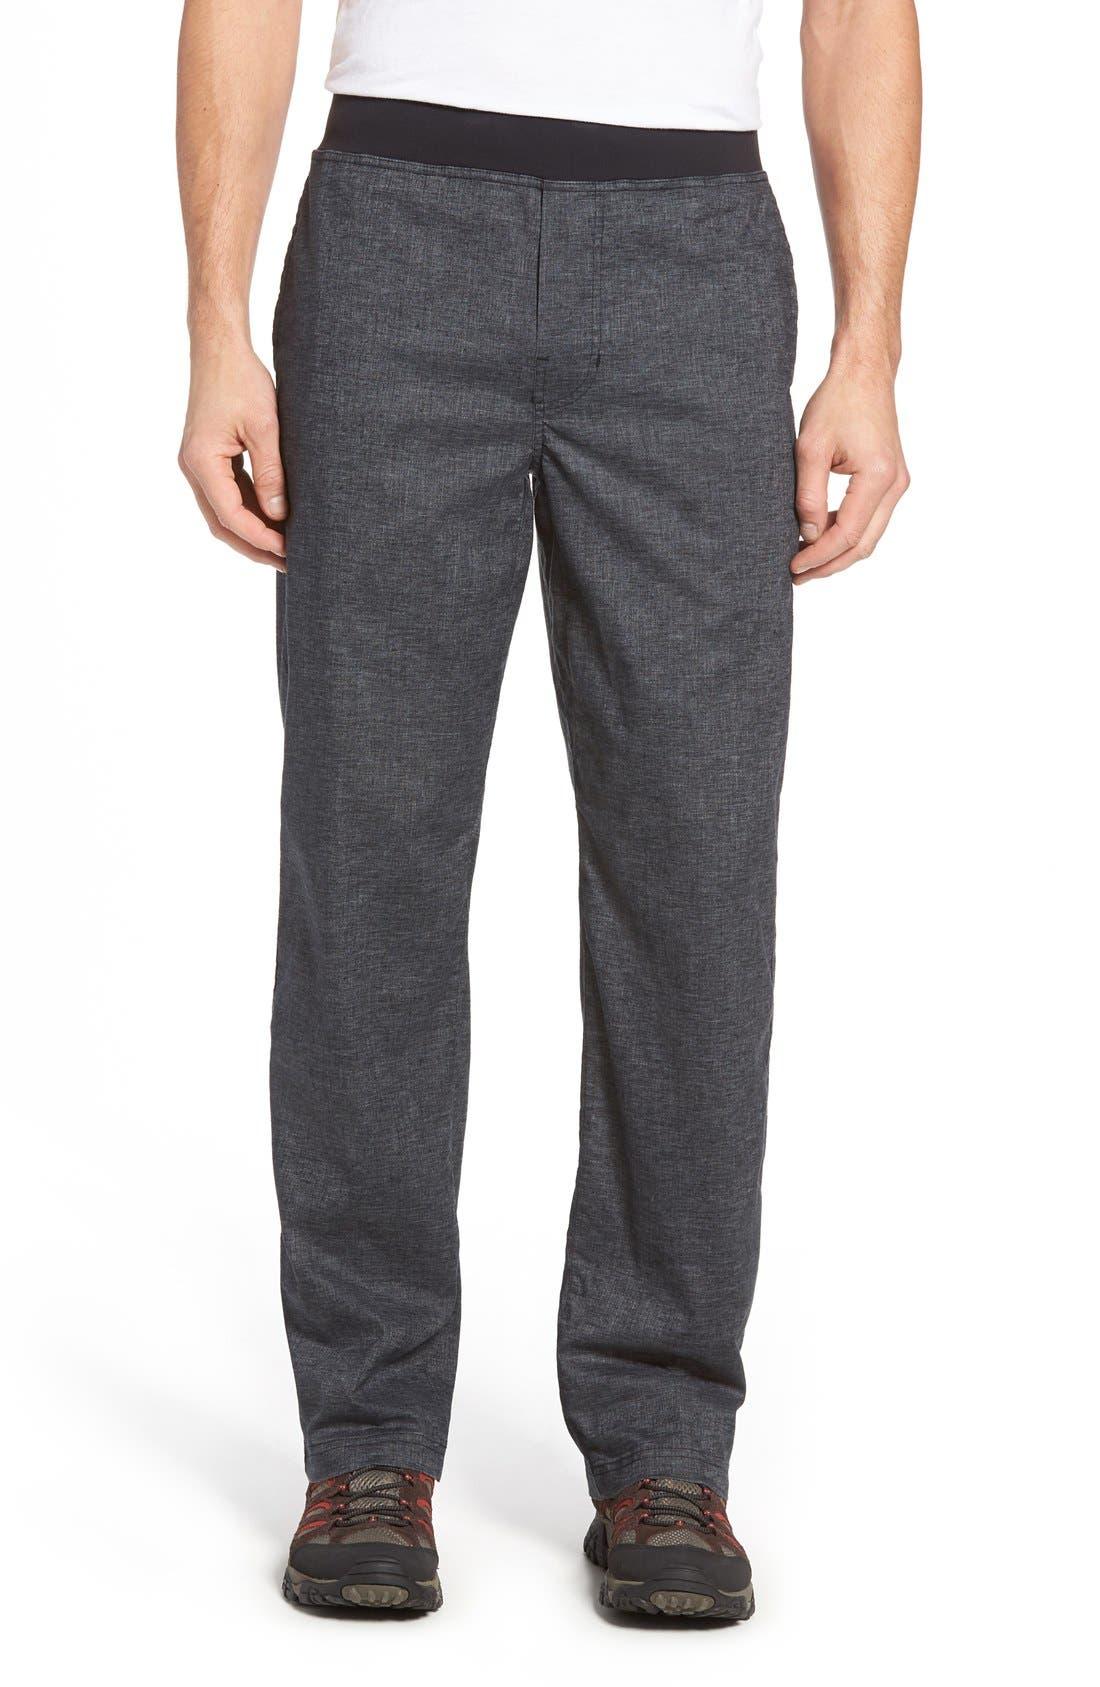 Vaha Pants,                         Main,                         color, Black